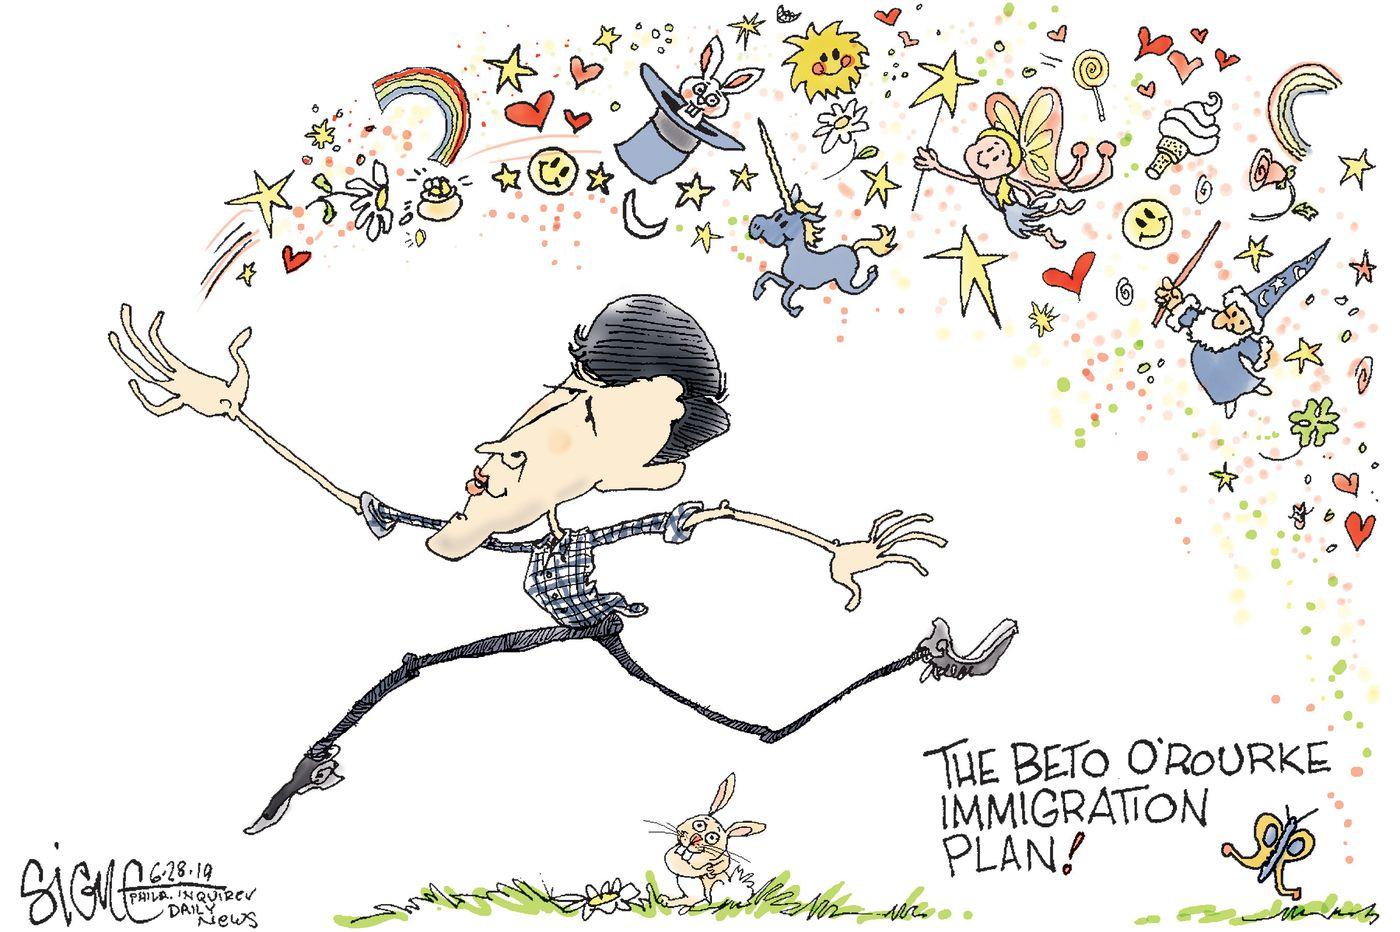 Political Cartoon: Beto O'Rourke's fantastic immigration plan